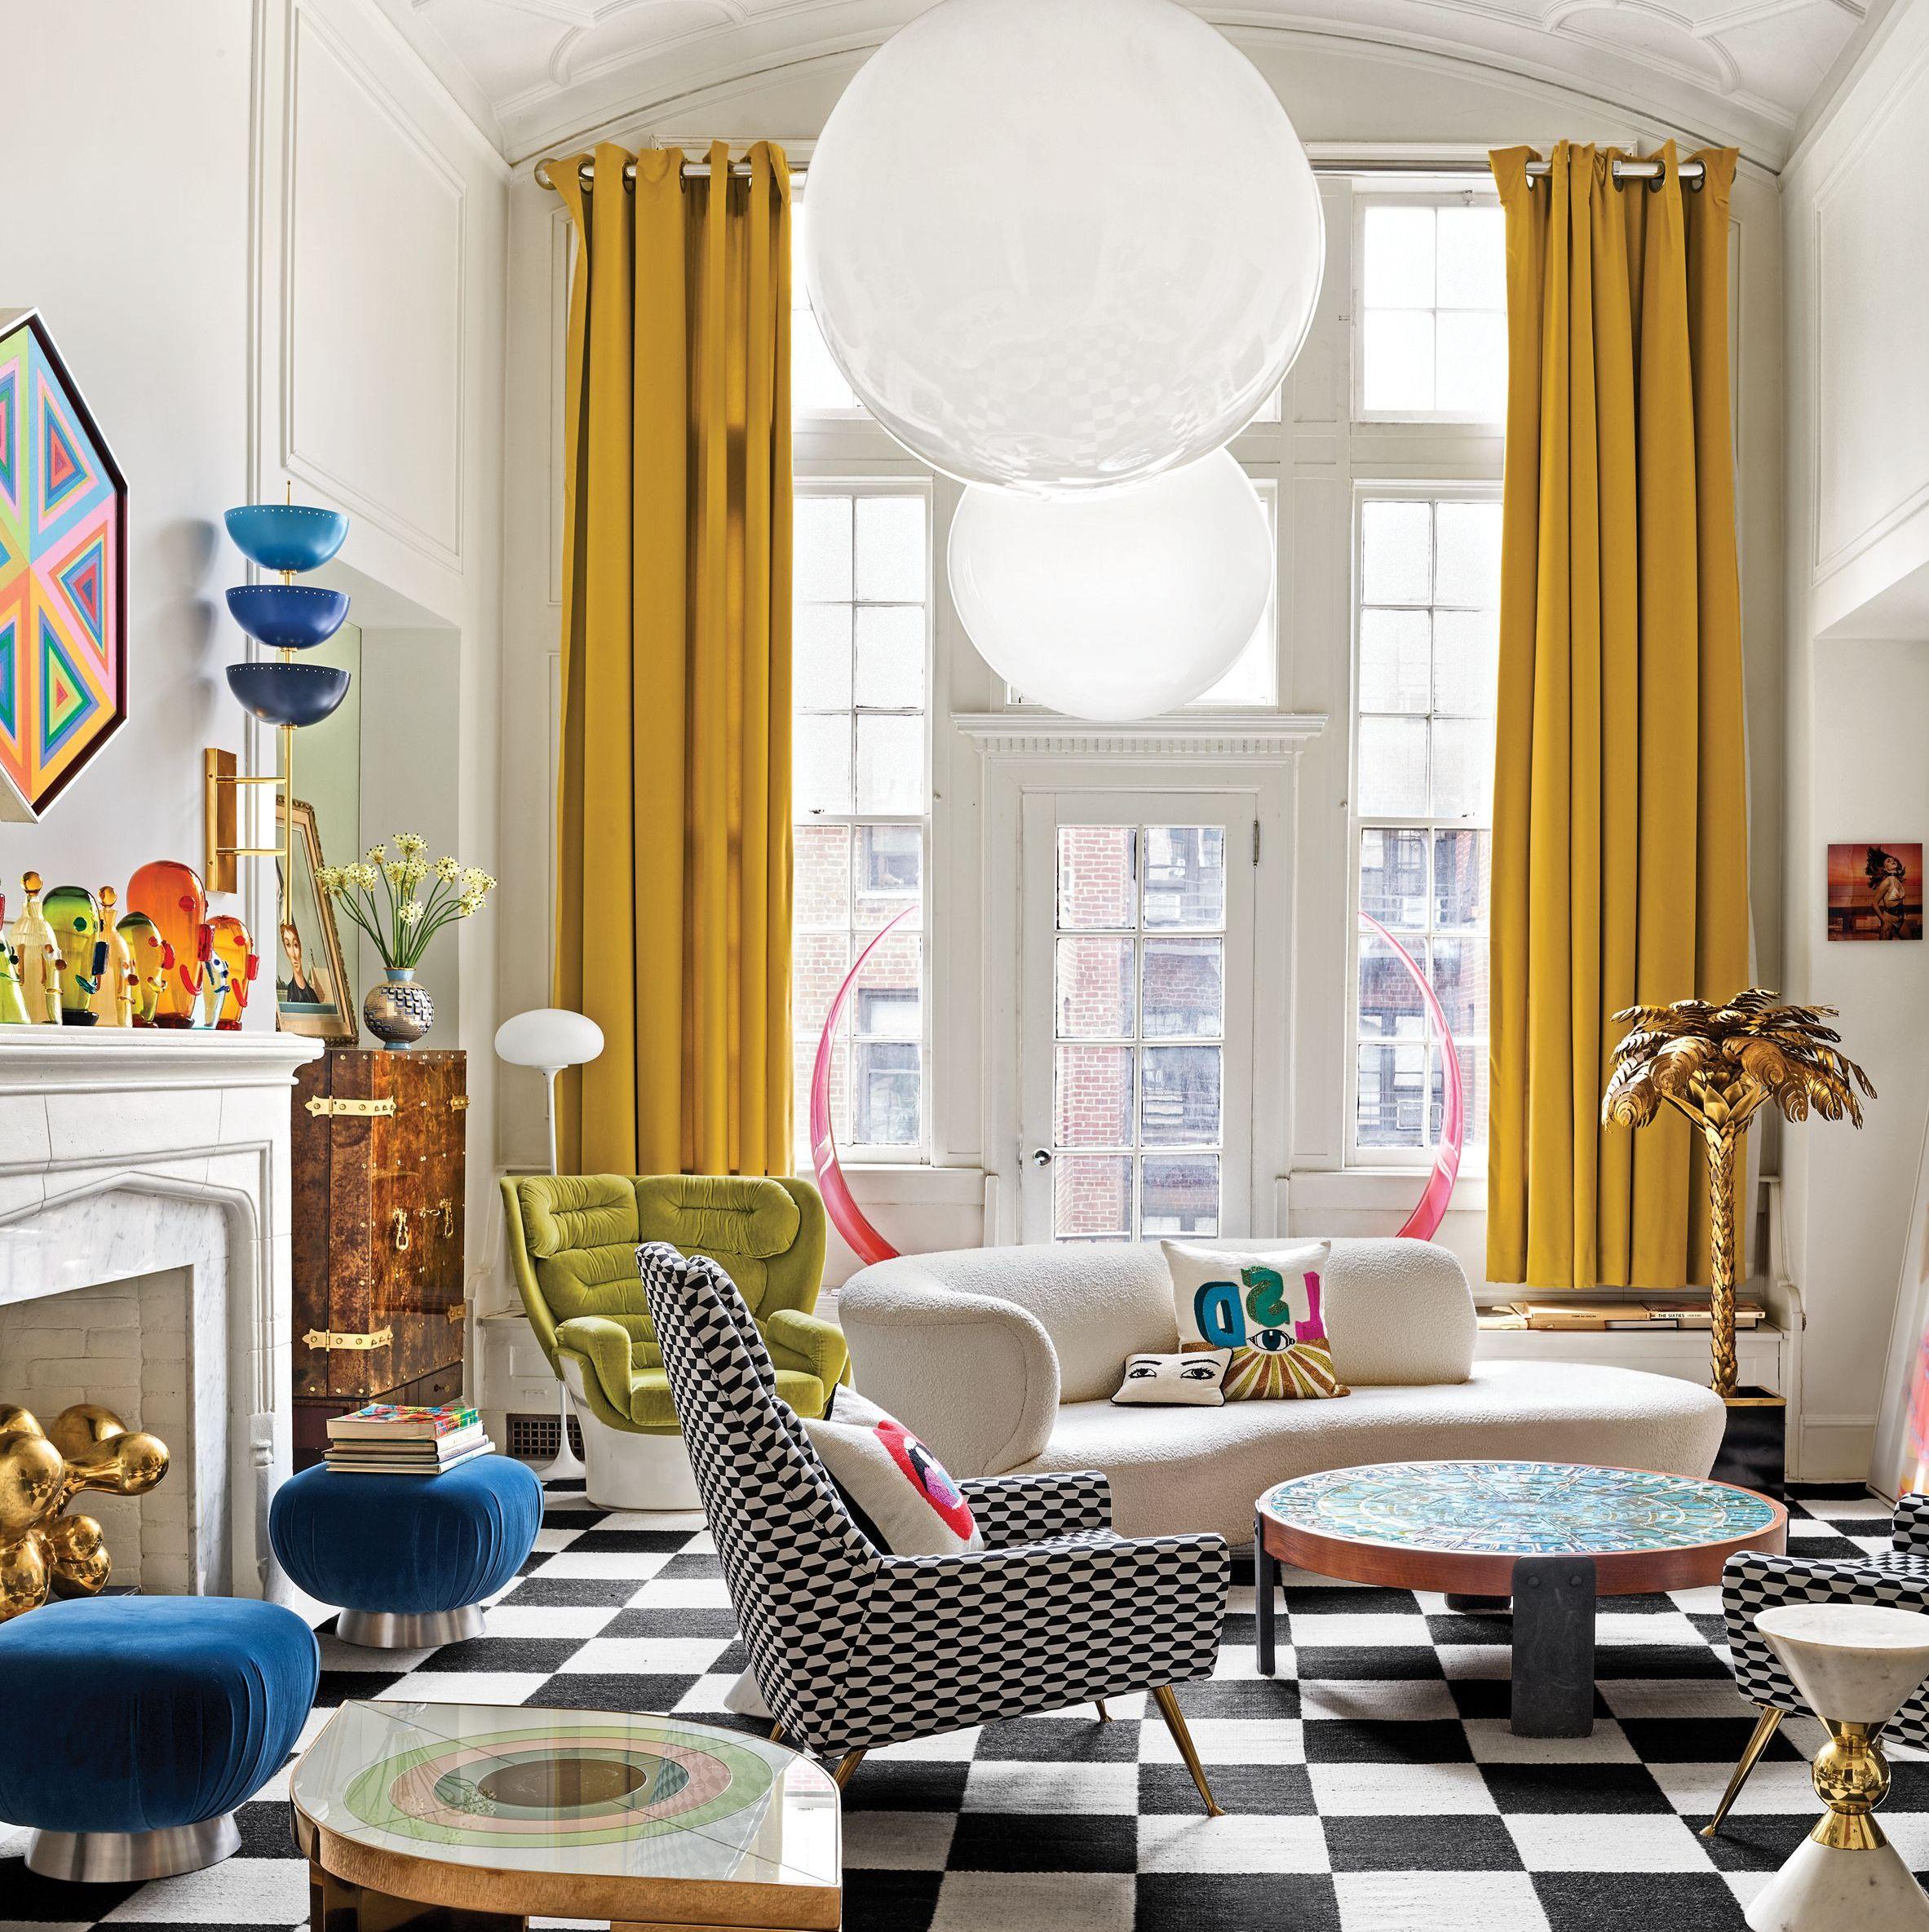 Jonathan Adler and Simon Doonan Give Their Greenwich Village Home a Glitz Makeover